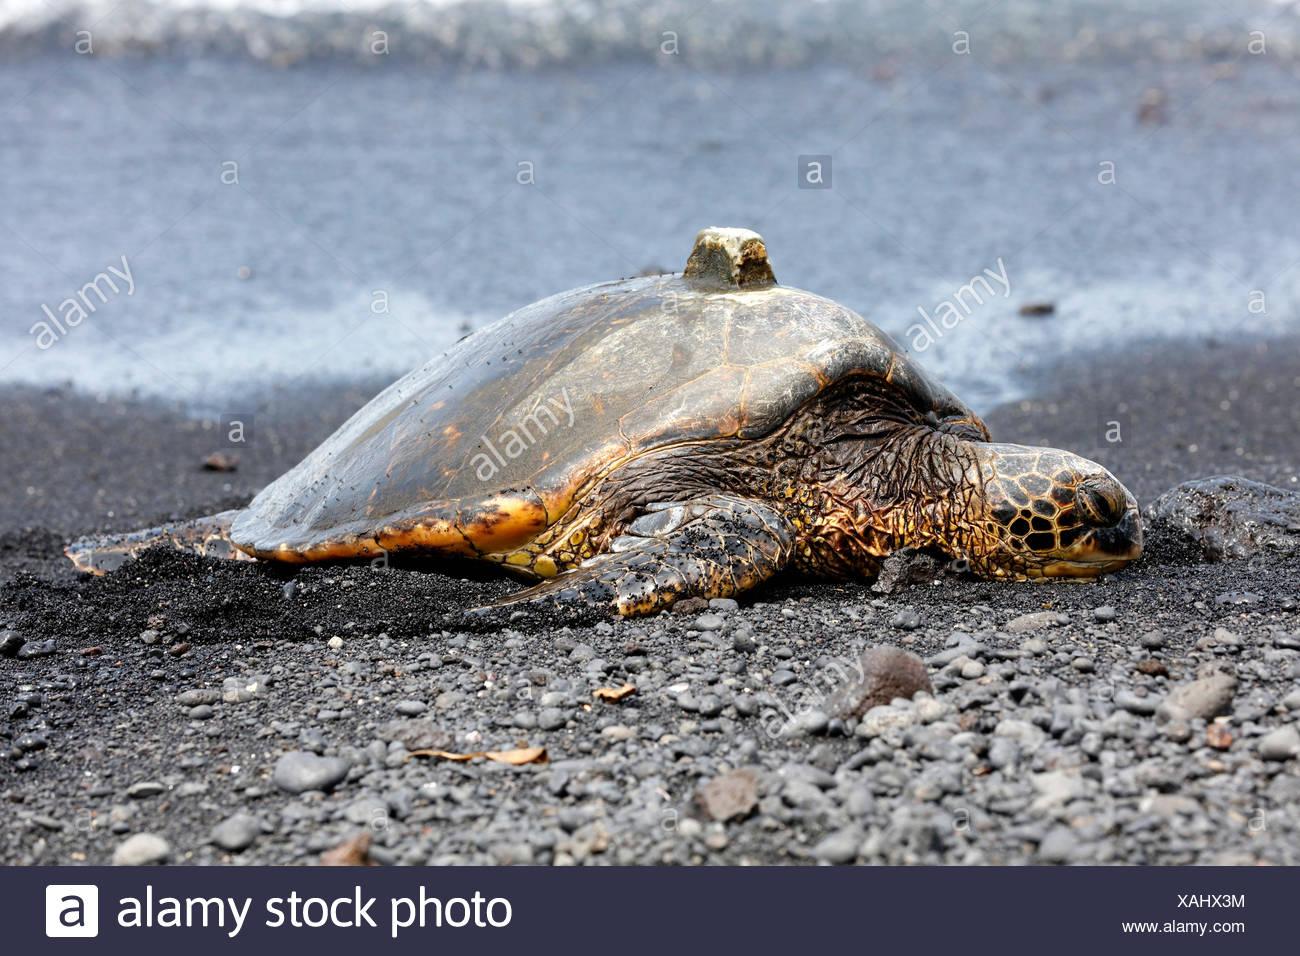 Grüne Meeresschildkröte (Chelonia Mydas) mit GPS-Empfänger auf Schale, Black Sand Beach, Punalu'u, Big Island, Hawaii, USA Stockbild